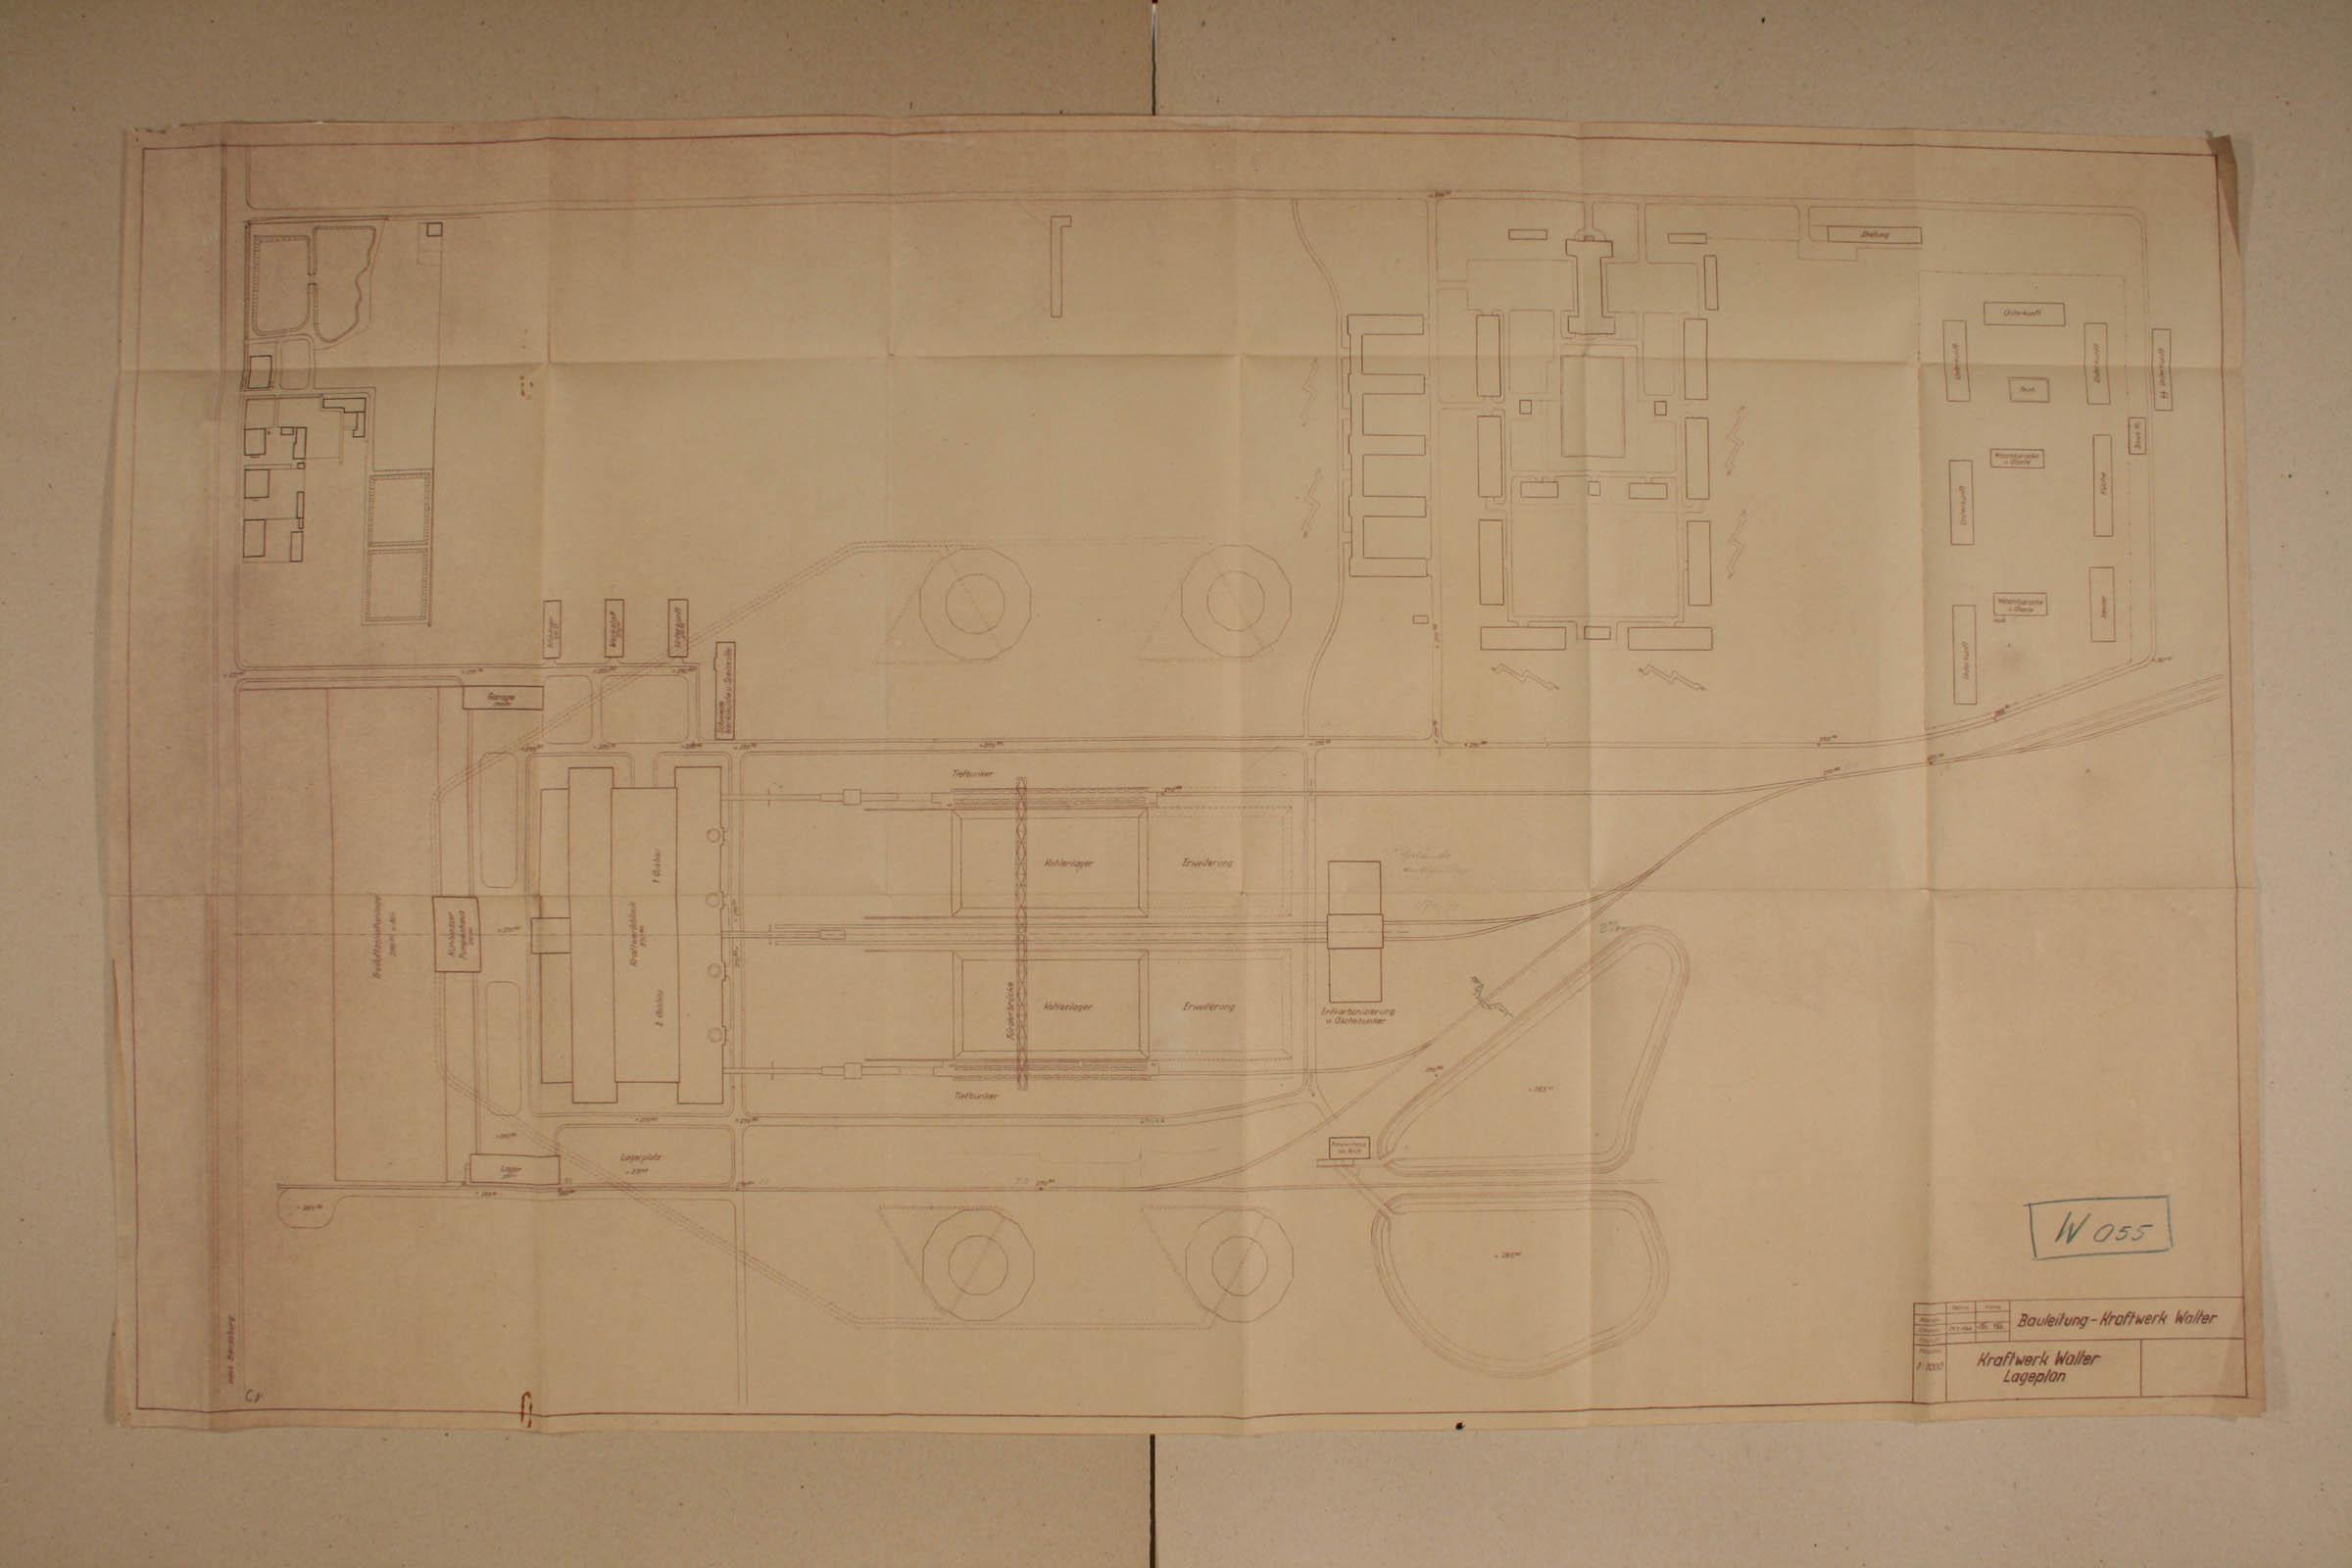 Technical drawing of sub camp Lagischa and Kraftwerk Walter Archiwum Panstwowe w Katowicach Land 879 70 1 19